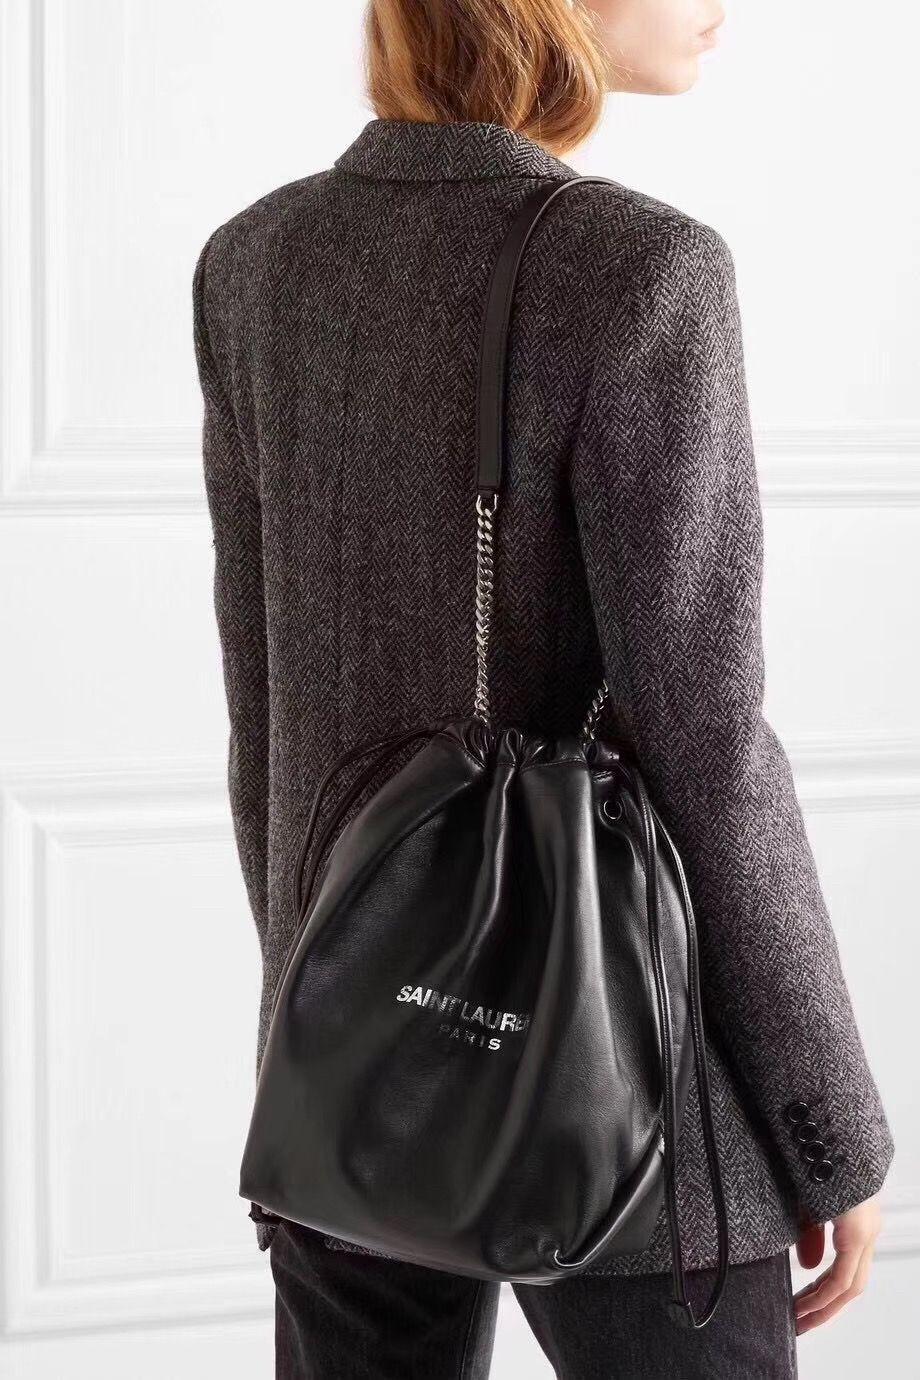 52d9253f711 Ysl Saint Laurent woman teddy drawstring bucket chain shoulder bag ...